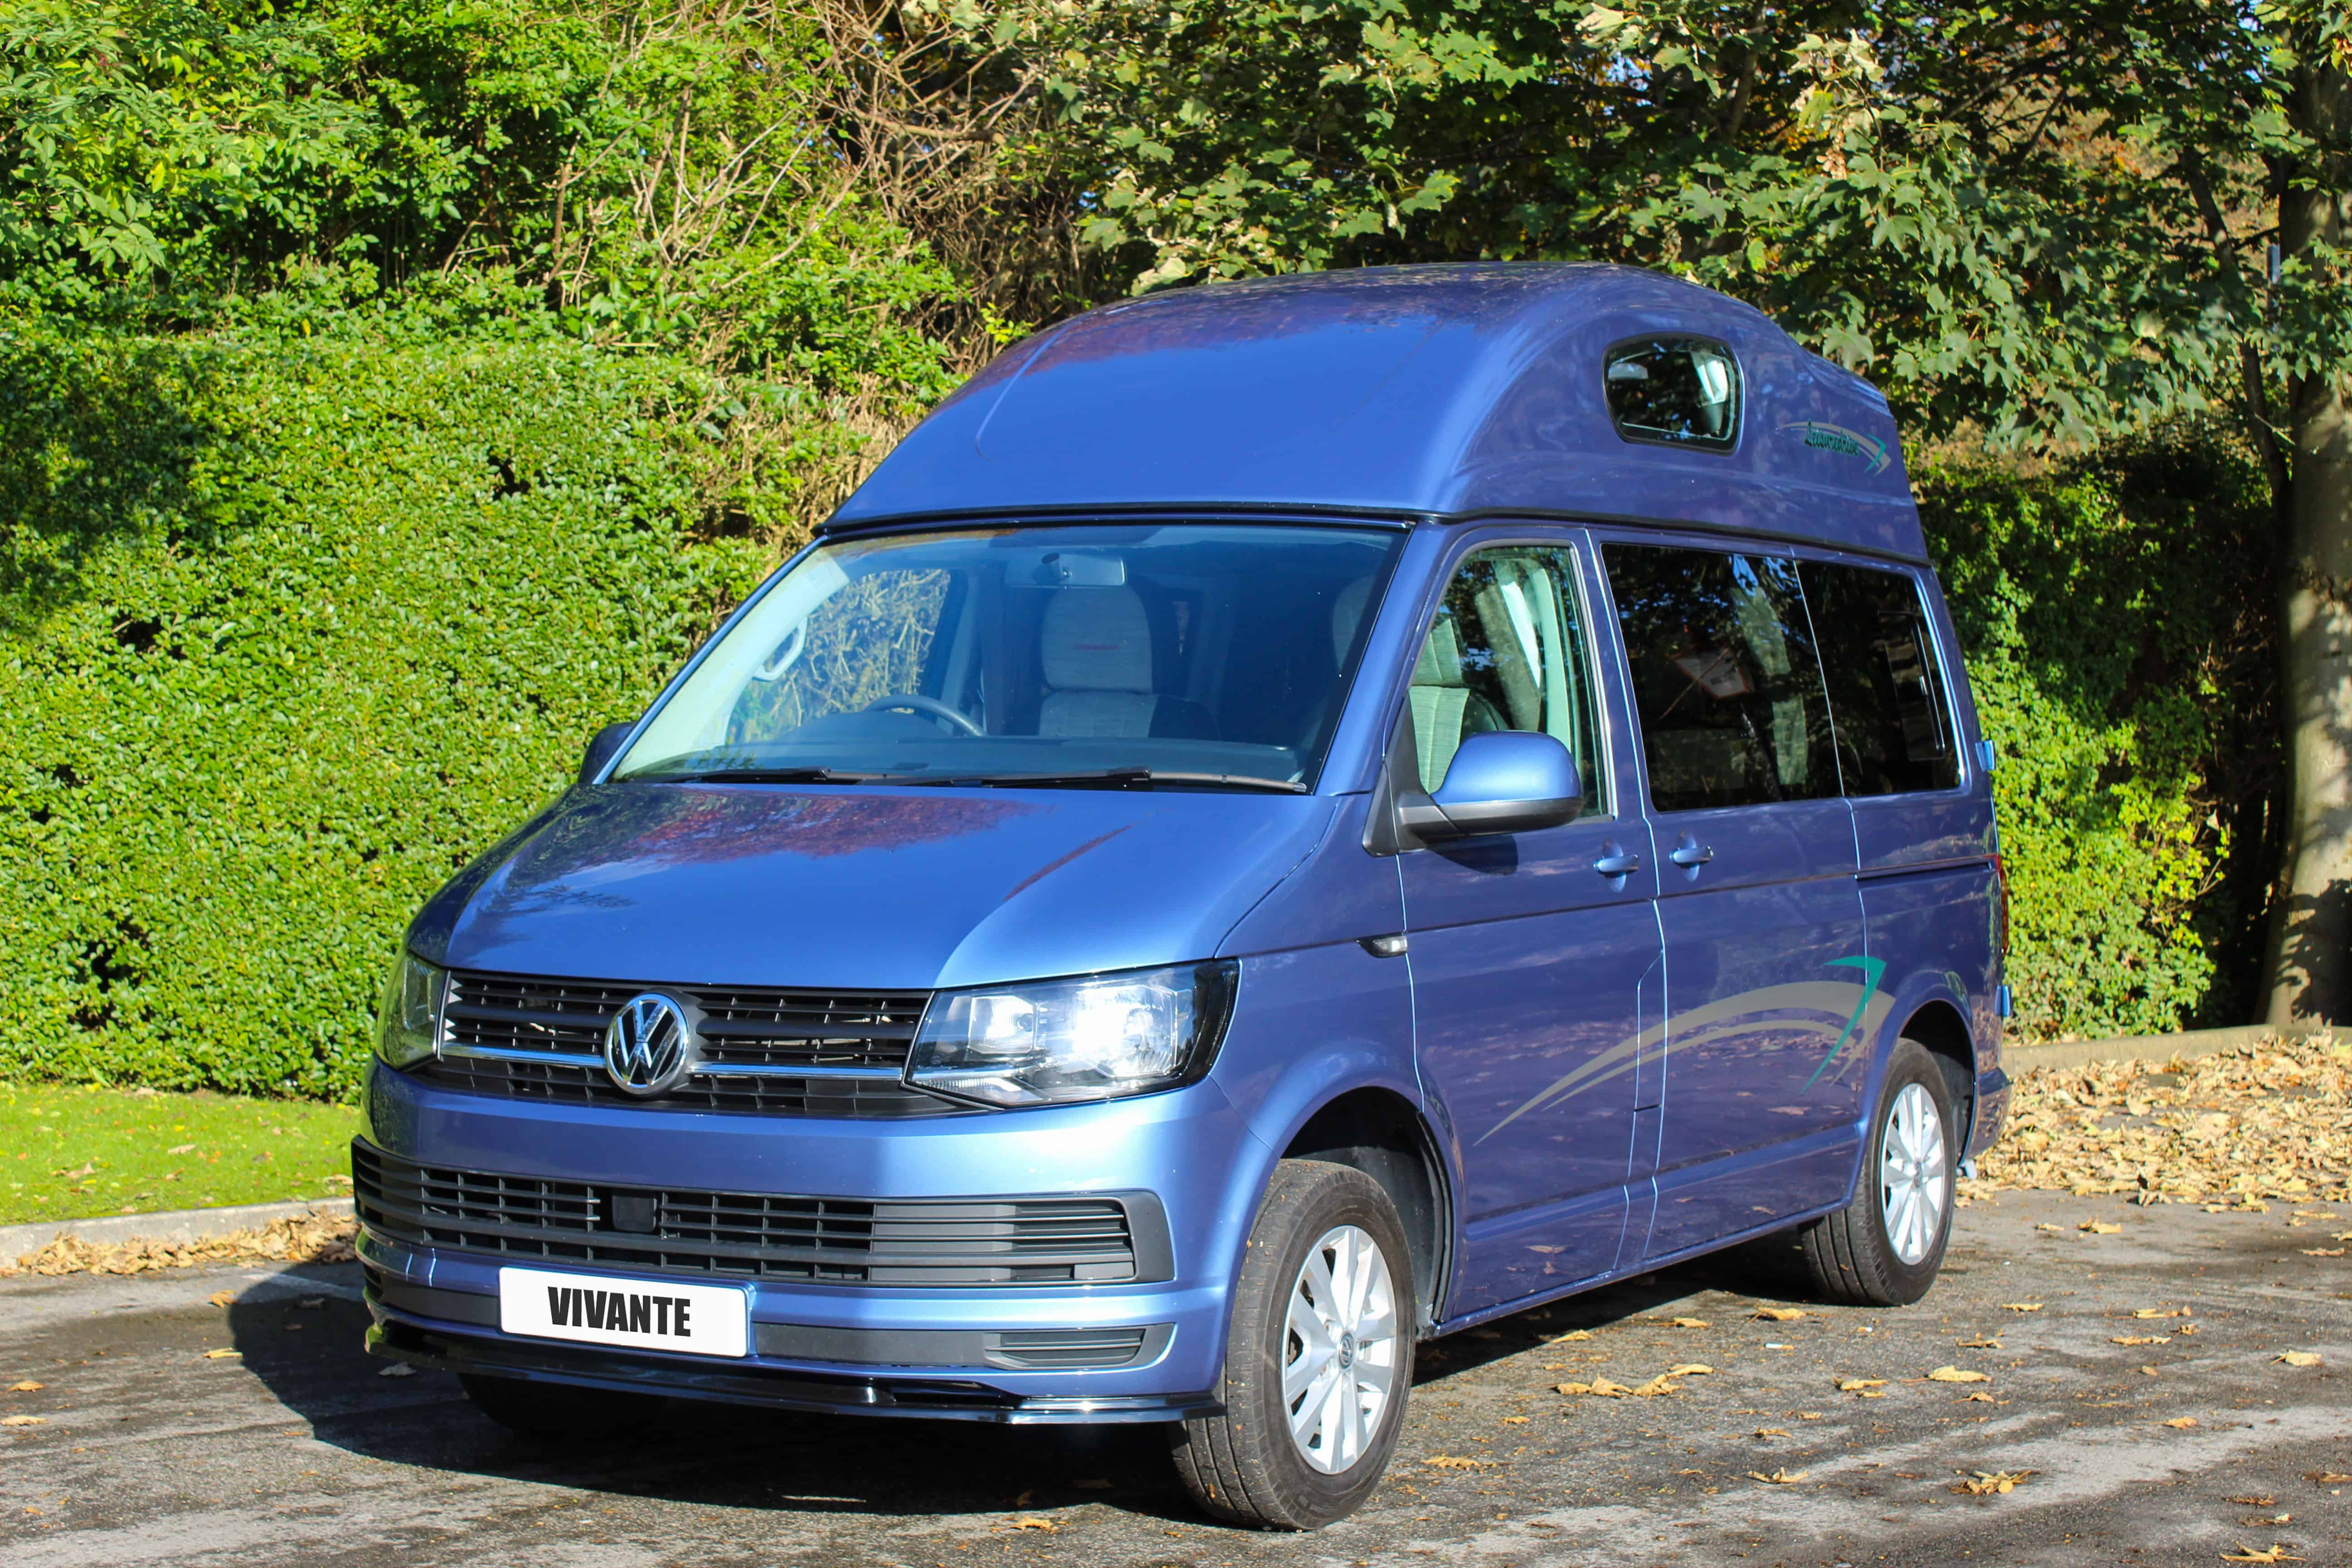 Convert a van to a camper, Convert Your Van, Leisuredrive, Leisuredrive